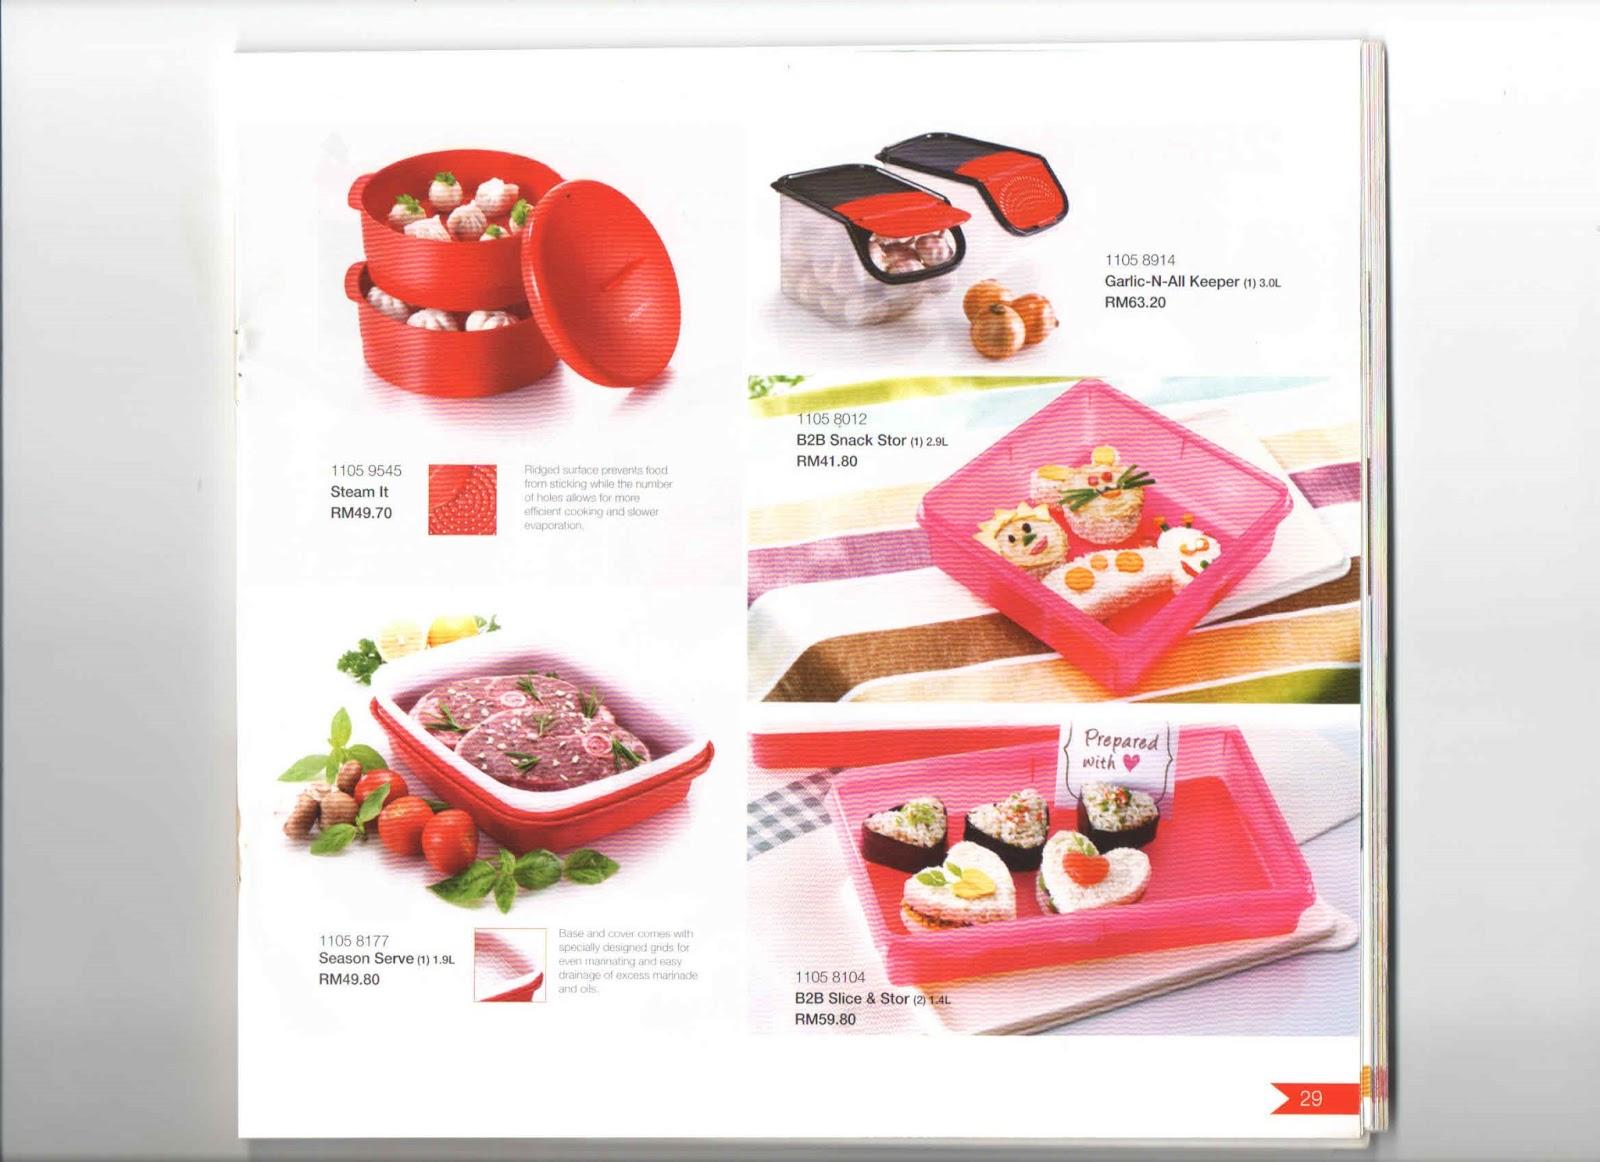 tupperware brands malaysia online katalog. Black Bedroom Furniture Sets. Home Design Ideas